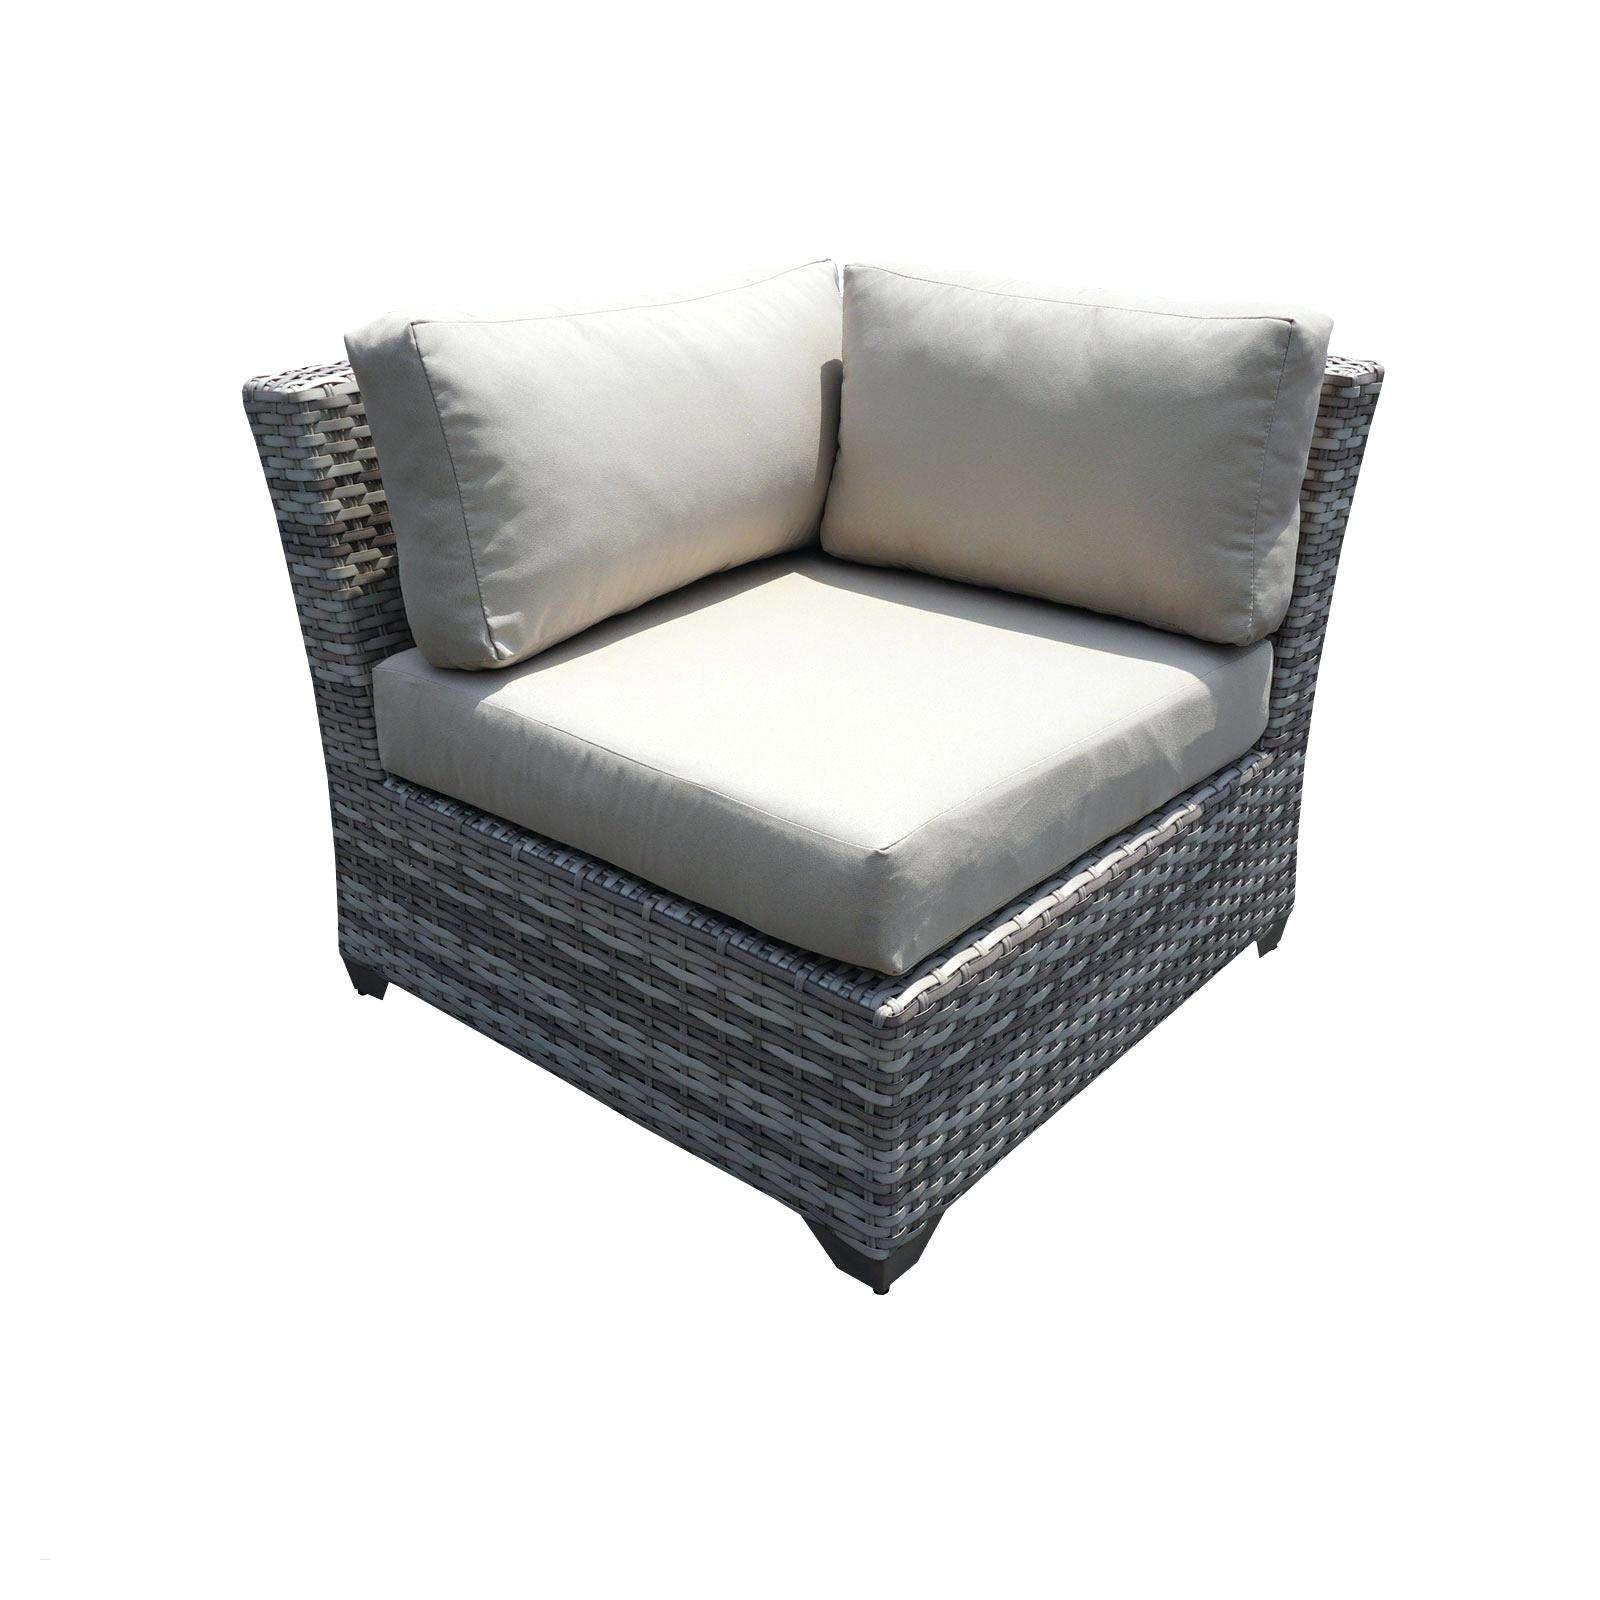 Sunbrella Sectional sofa Indoor Sunbrella Outdoor Furniture Fresh Wicker Outdoor sofa 0d Patio